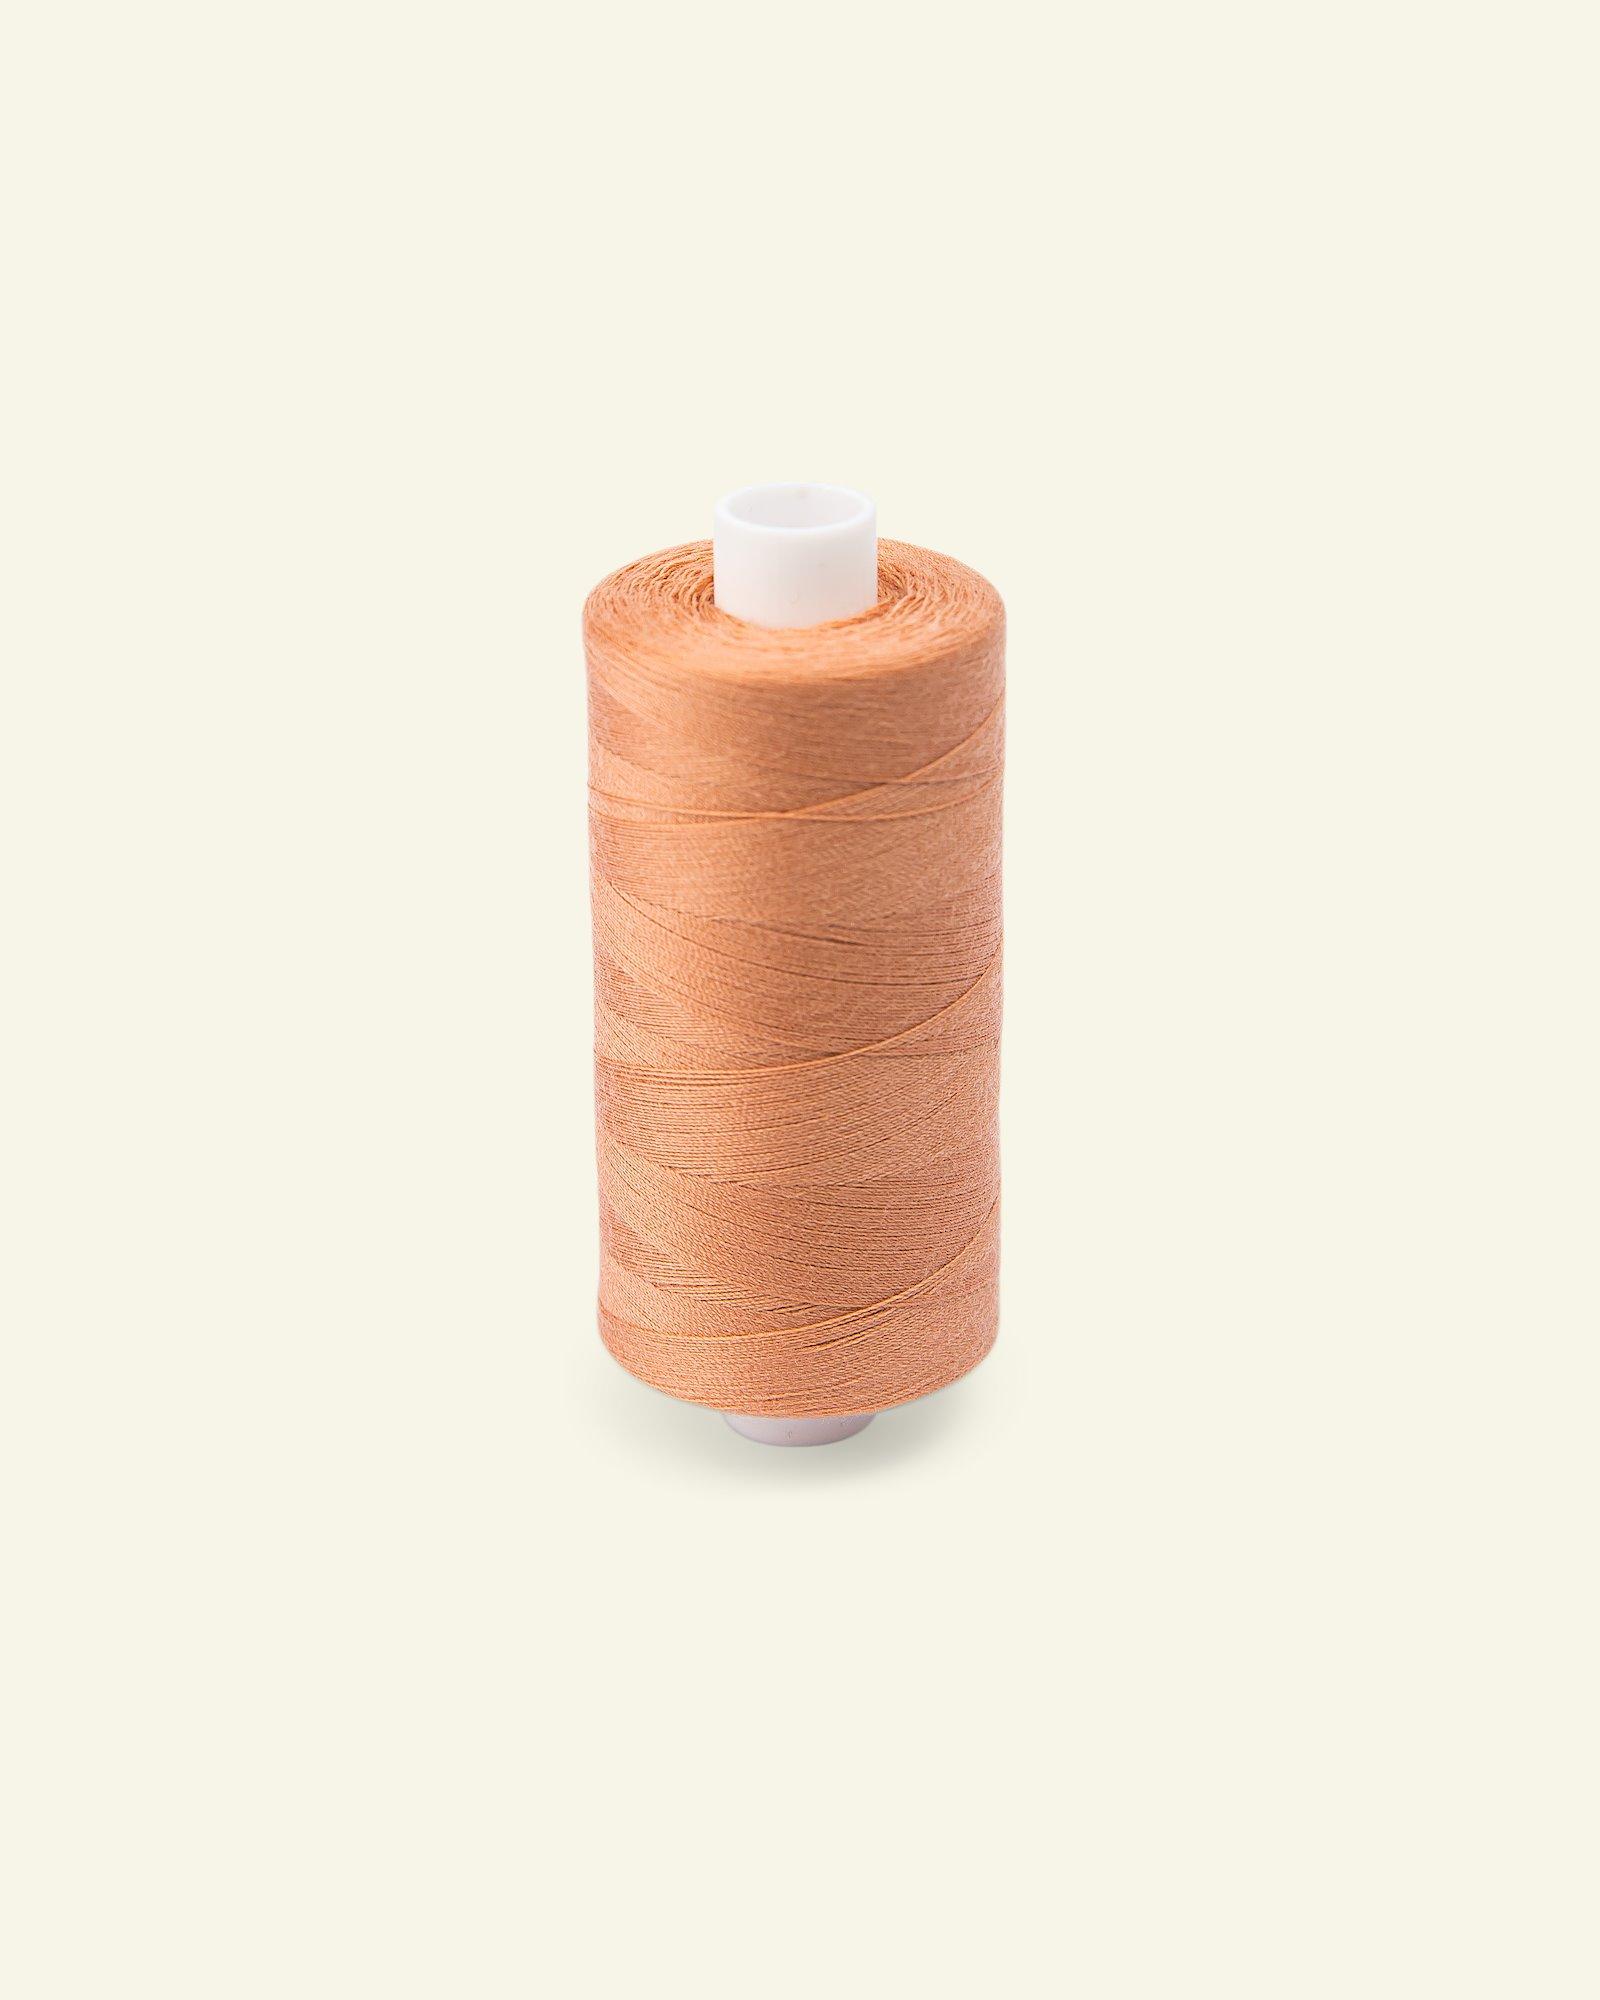 Sewing thread light terracotta 1000m